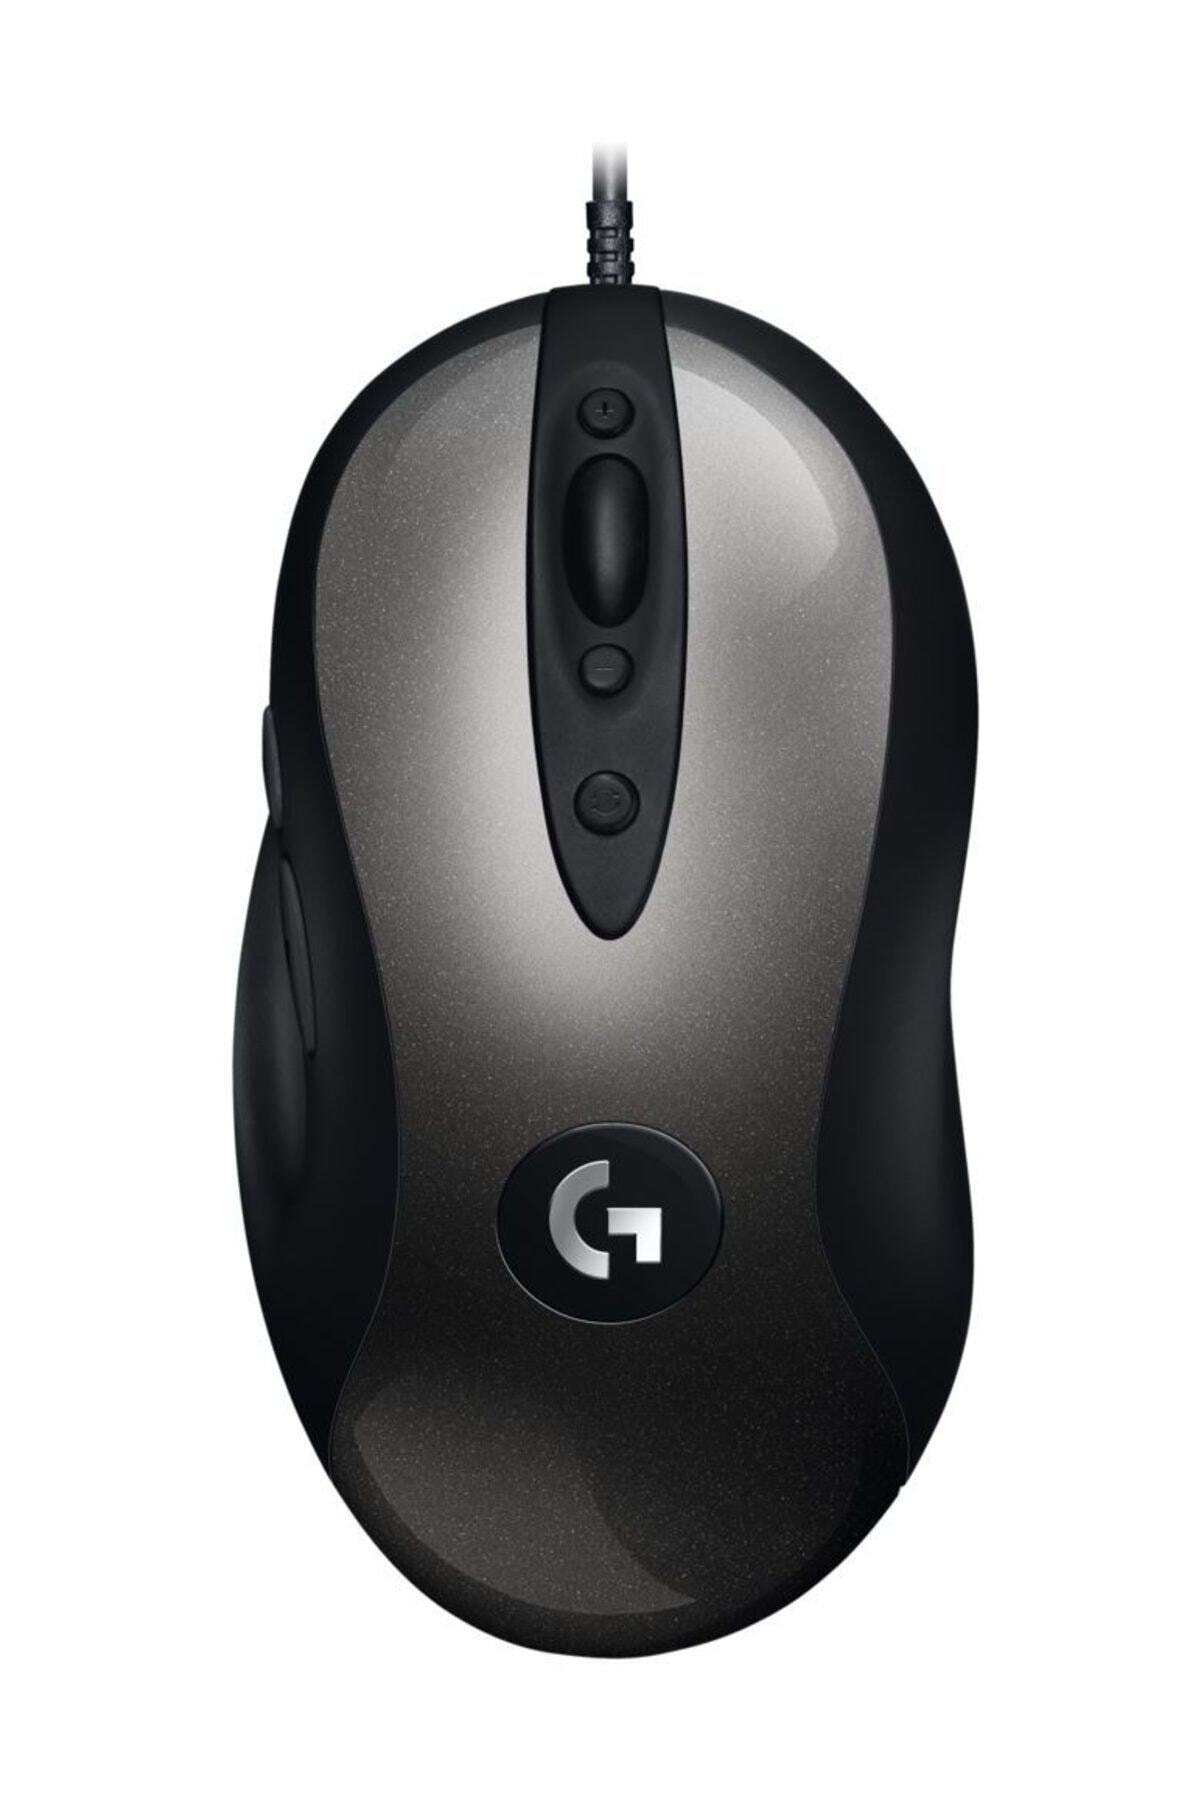 logitech Mx518 Hero Sensör 16000dpı Kablolu Oyuncu Mouse - 910-005545 1